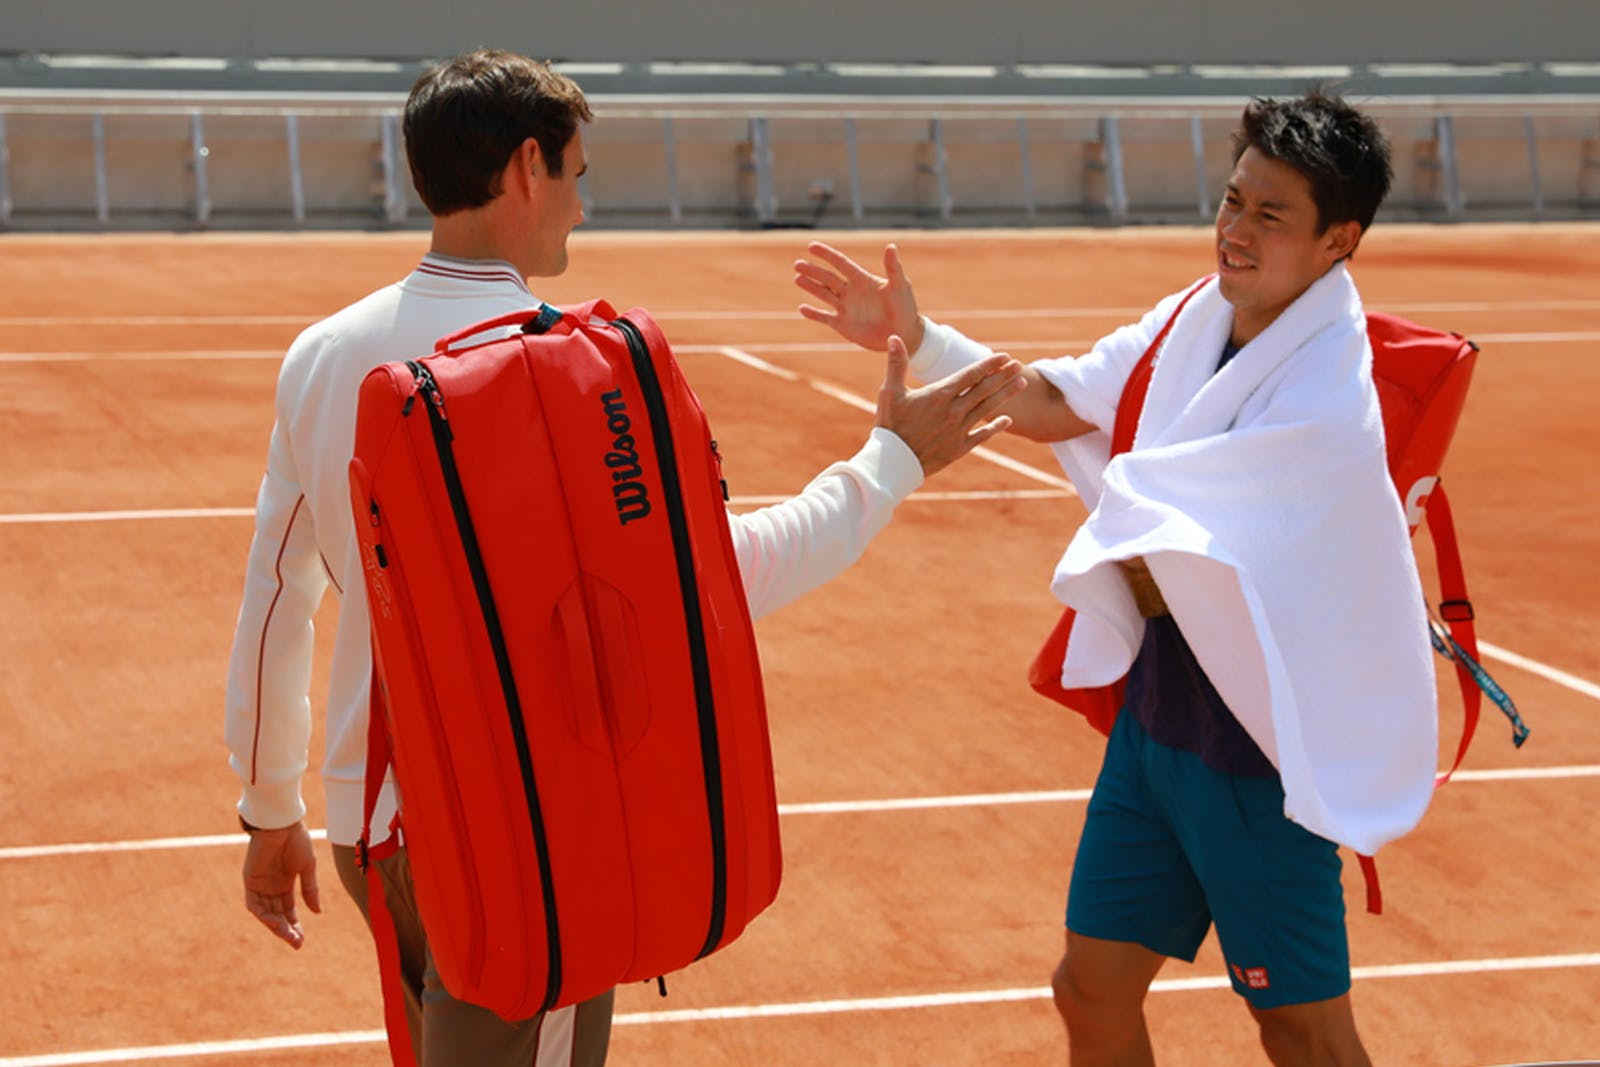 Roger Federer and Kei Nishikori practice